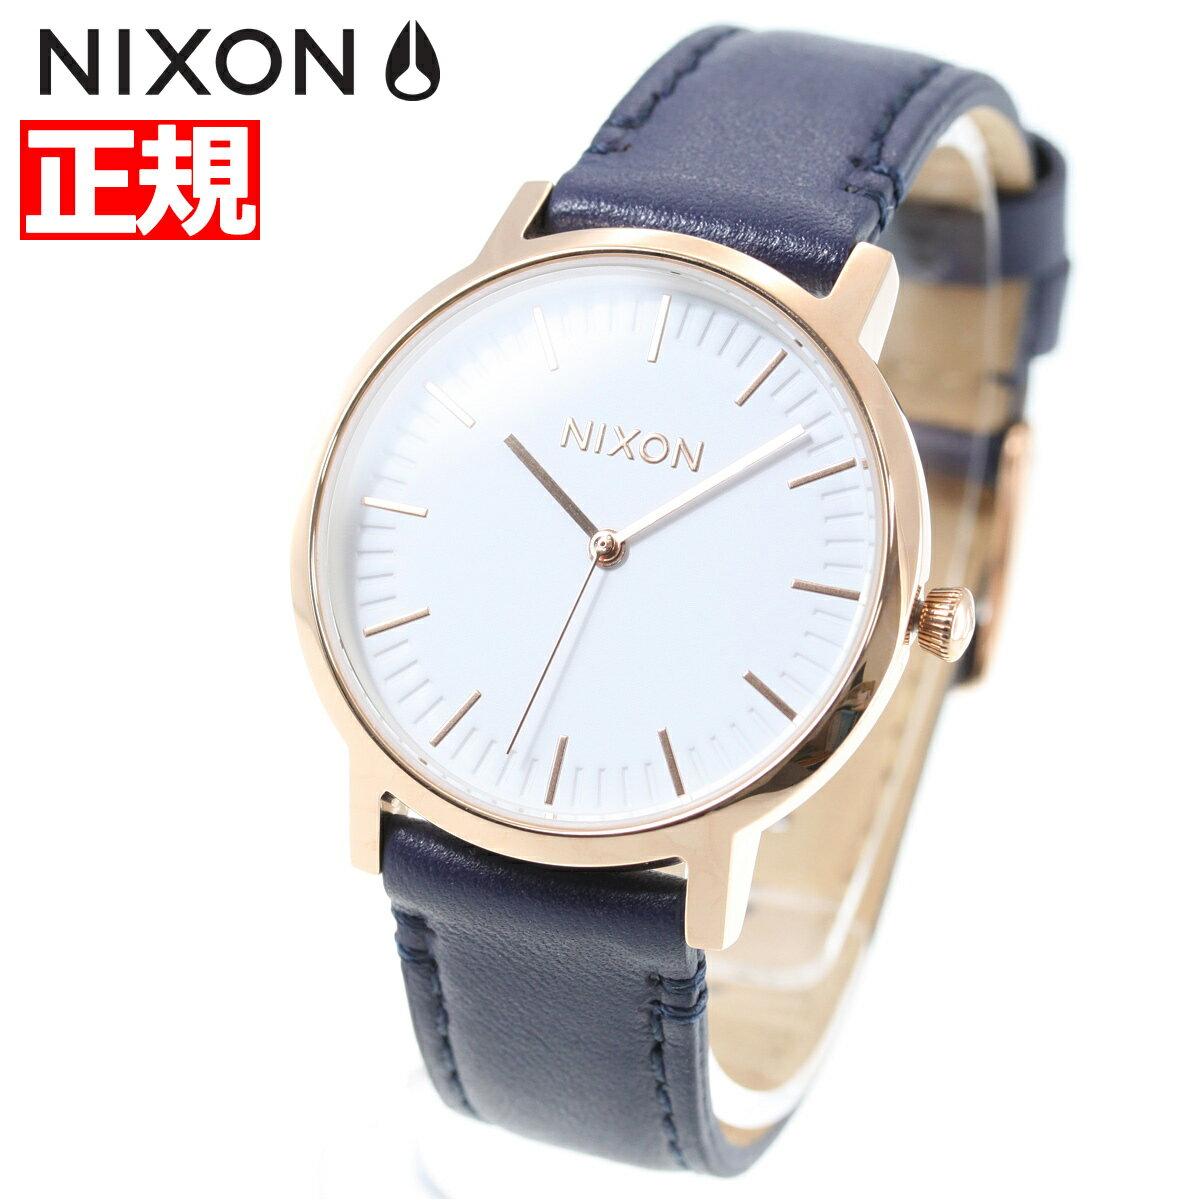 腕時計, 男女兼用腕時計 35.5 NIXON 35 PORTER 35 LEATHER NA11992798-00